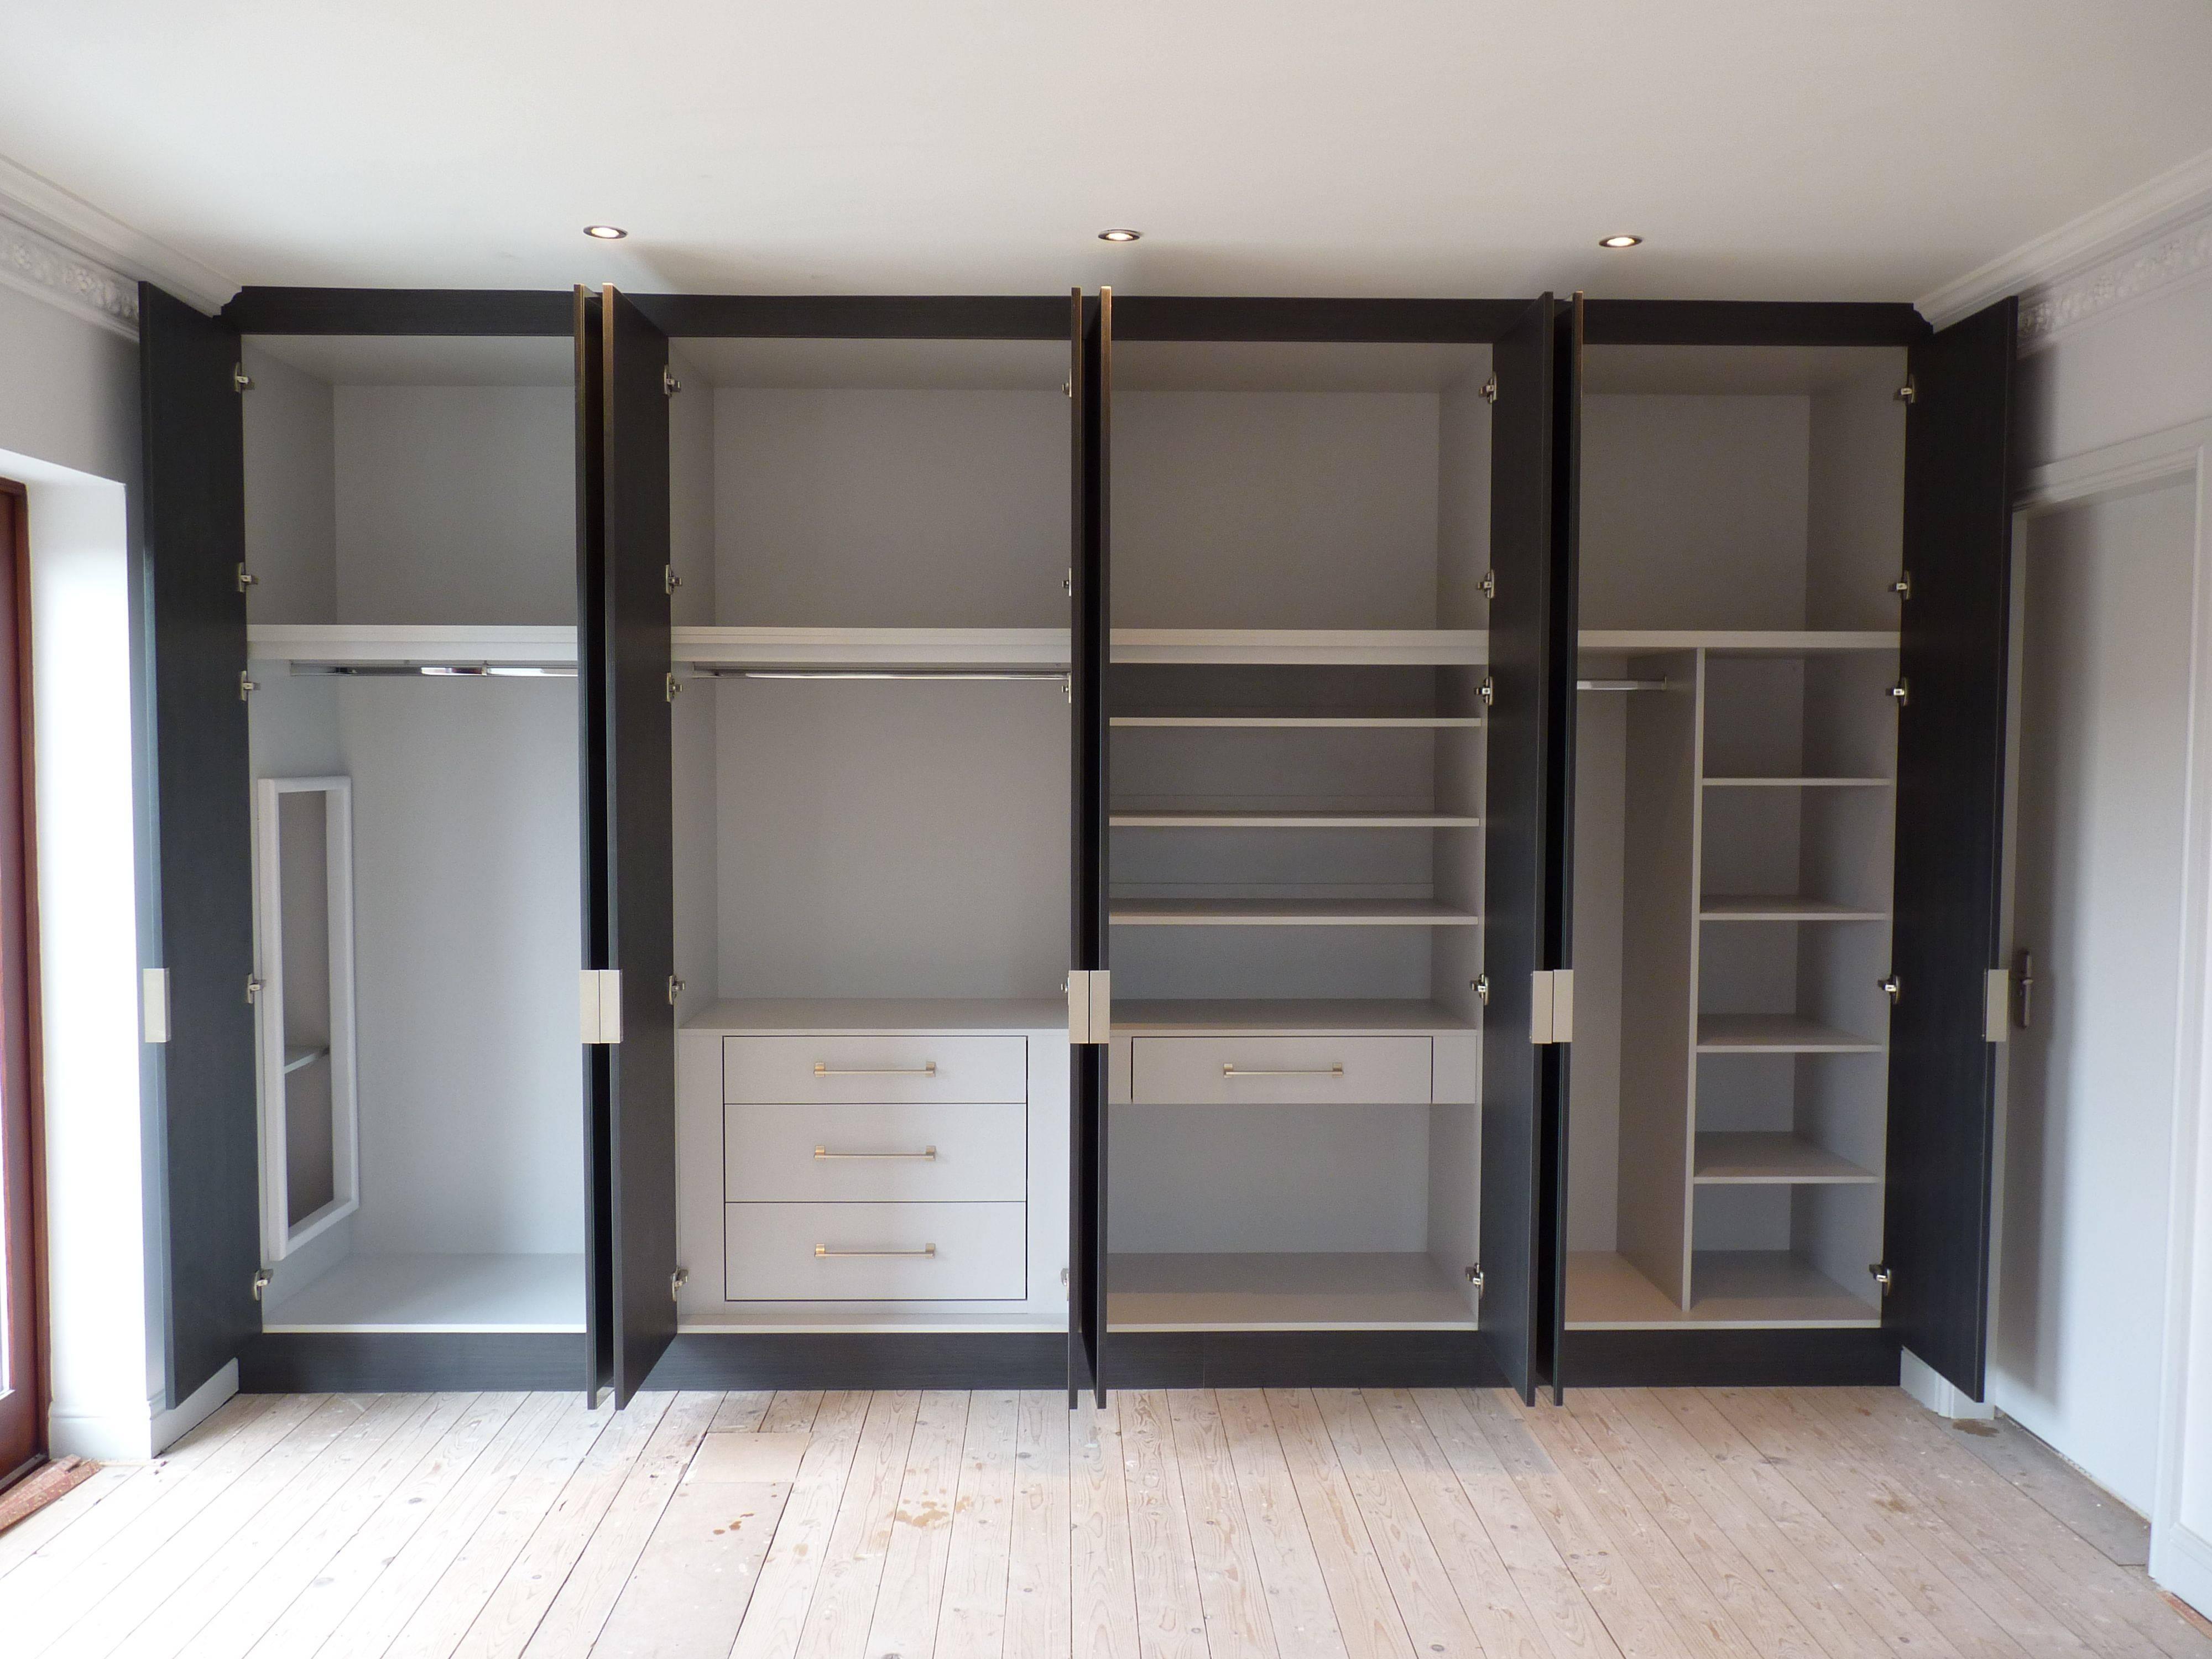 Built-In Wardrobe « Shavings intended for Curved Wardrobe Doors (Image 8 of 30)